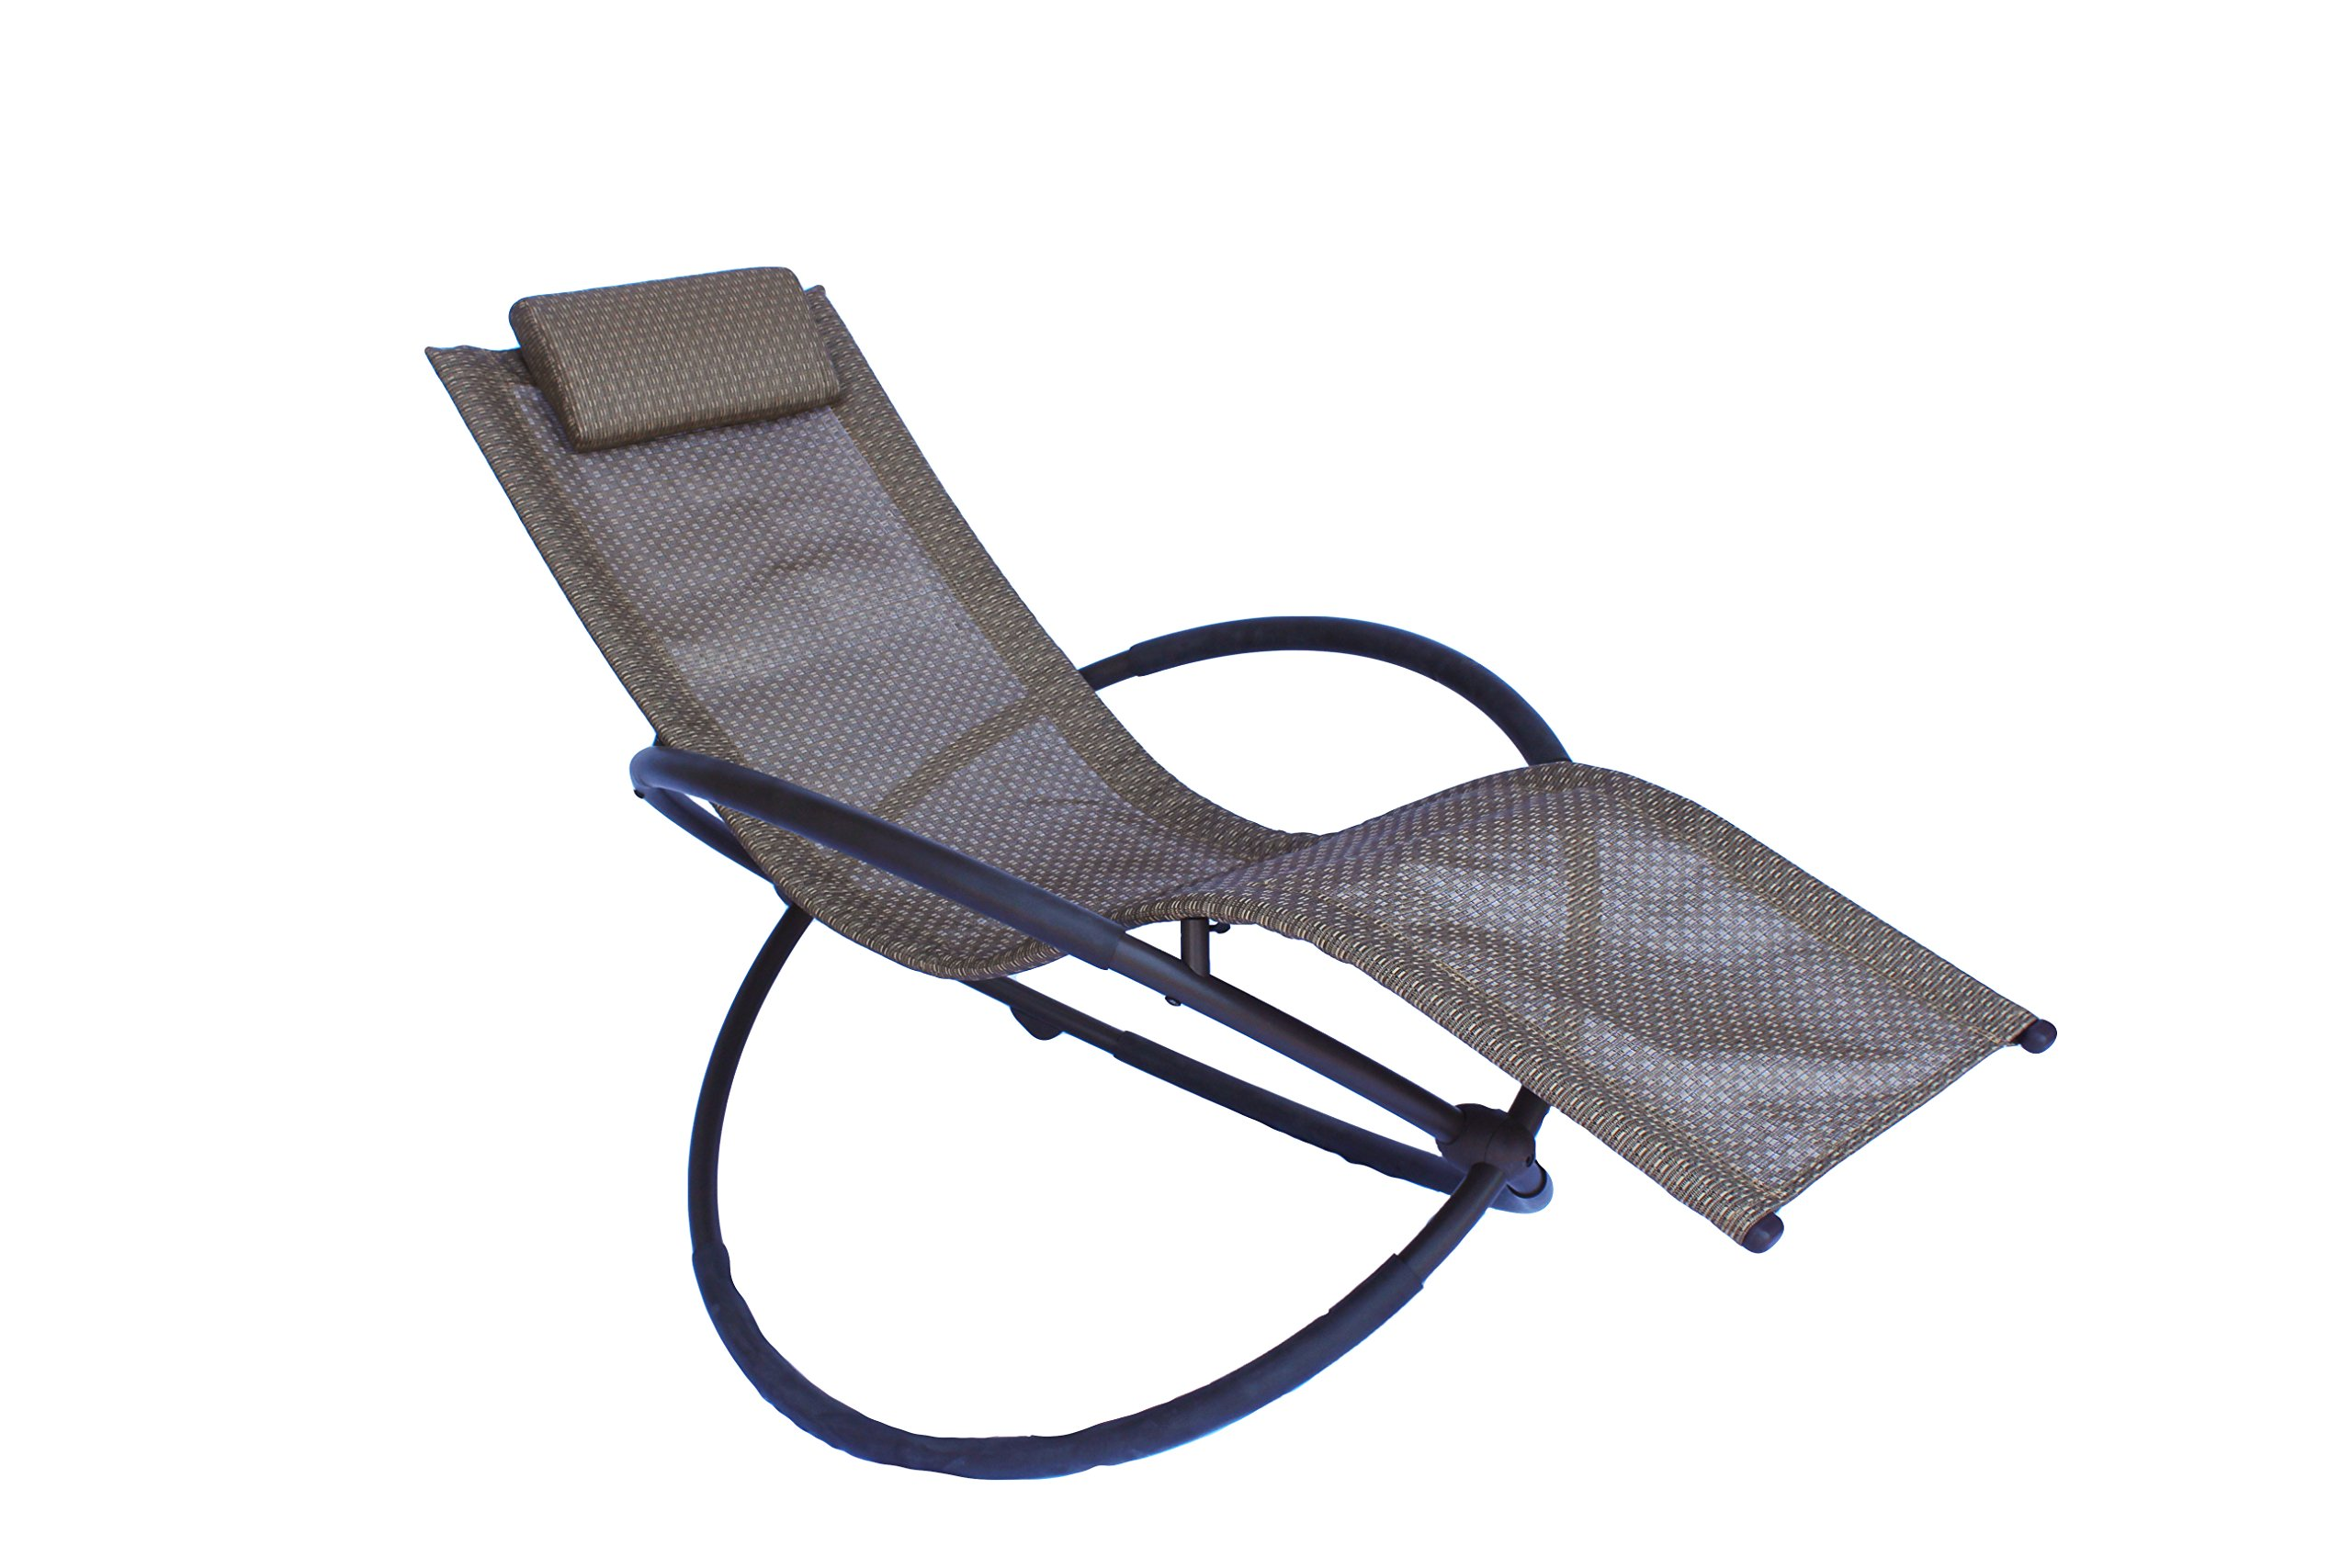 Luna Orbital Foldable Zero Gravity Patio Lounger & Rocking Chair Measuring 64'' Long x 30'' Wide x 24'' High (Brown)